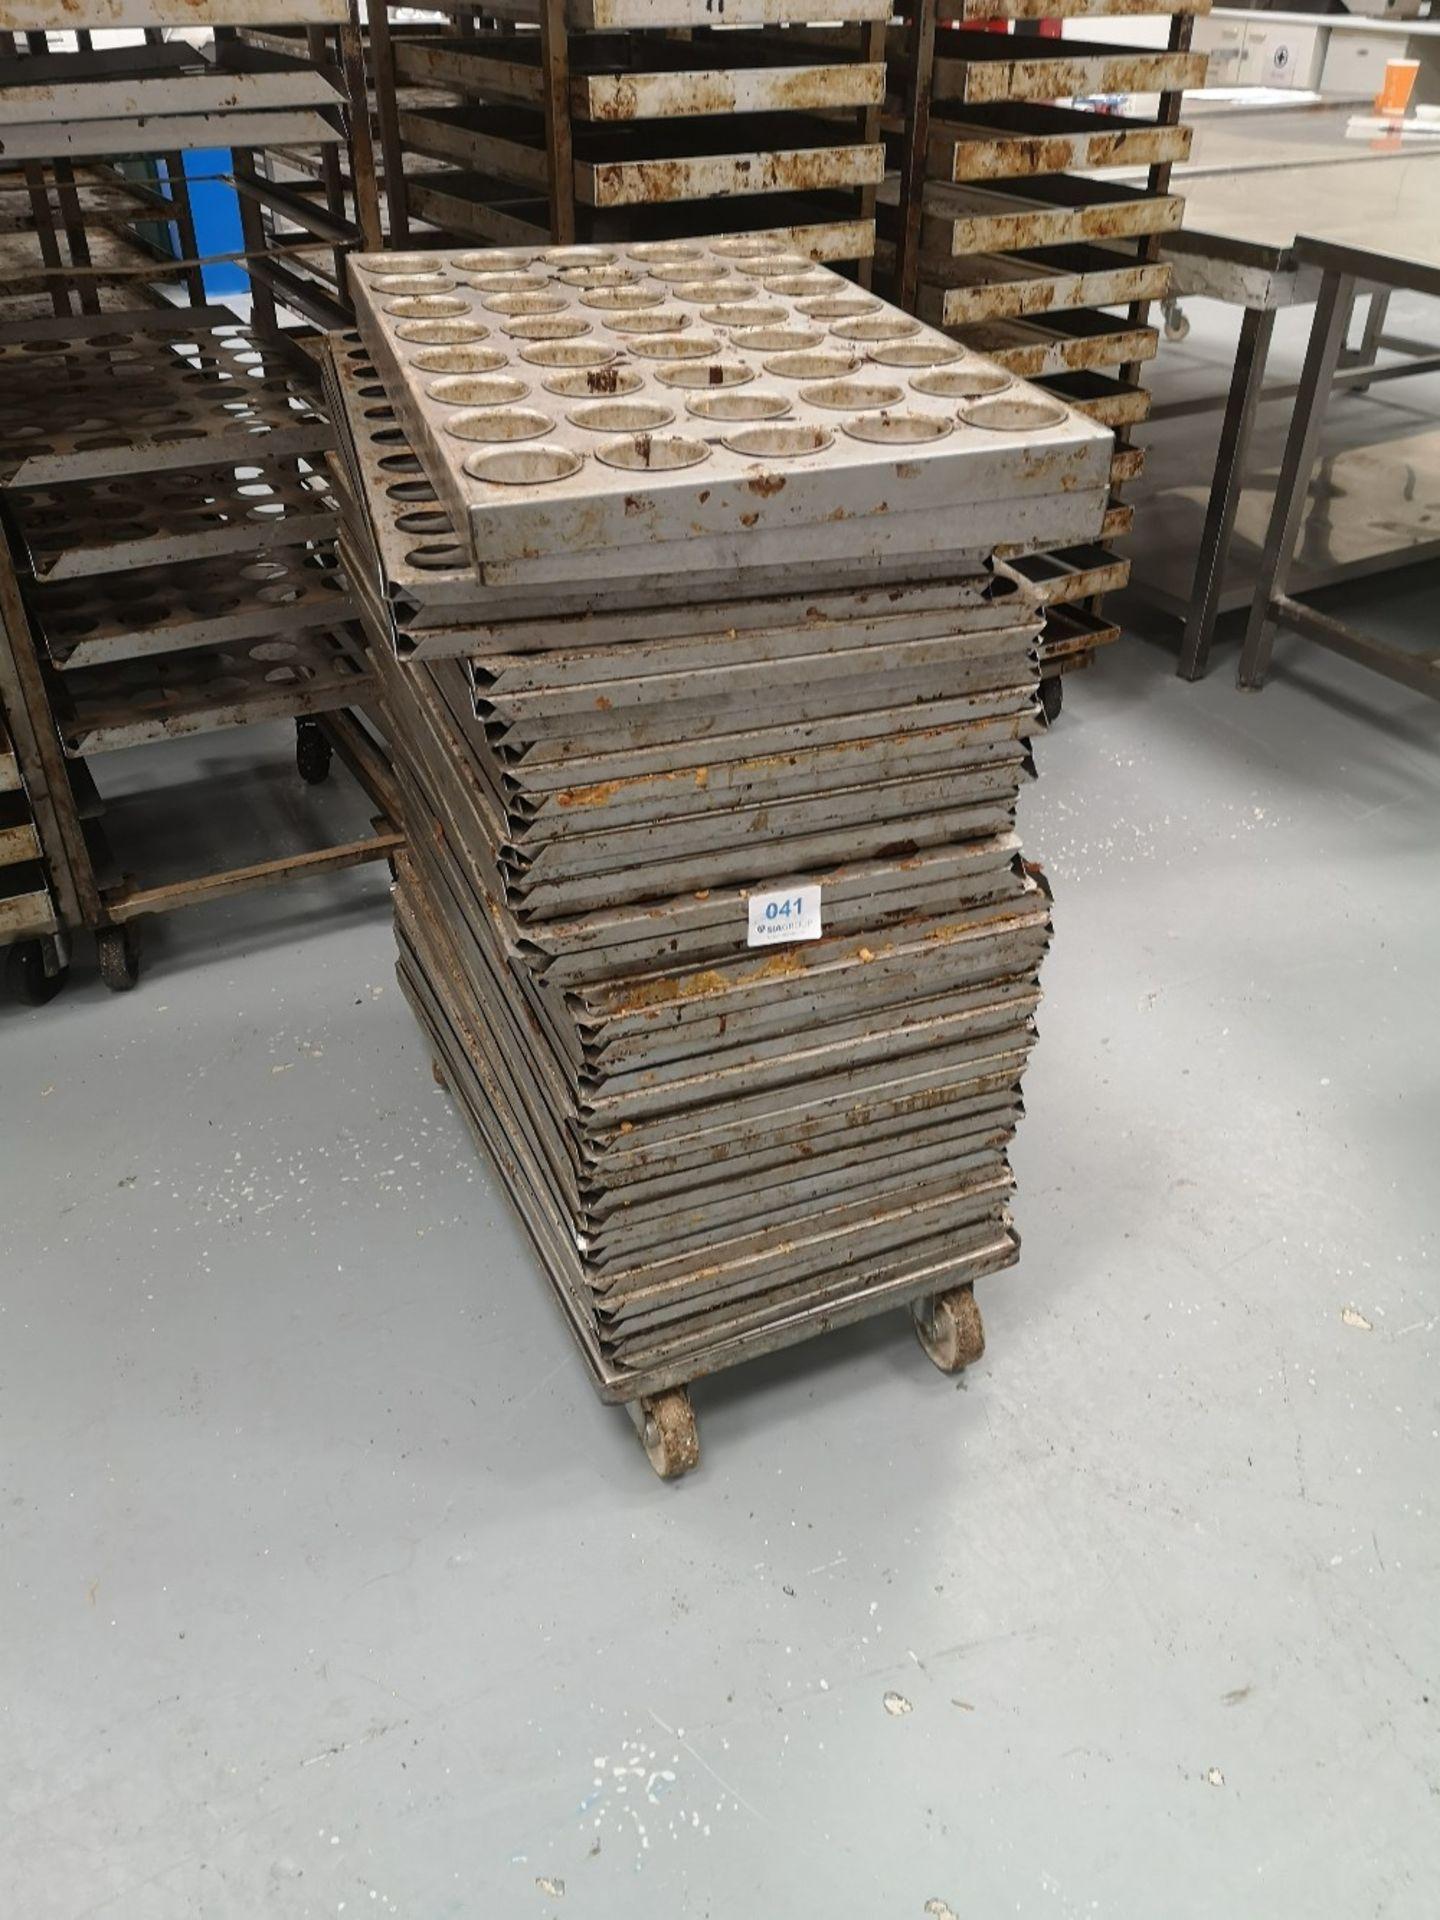 (40) Bakery Mould Racks/Trays - Image 3 of 3